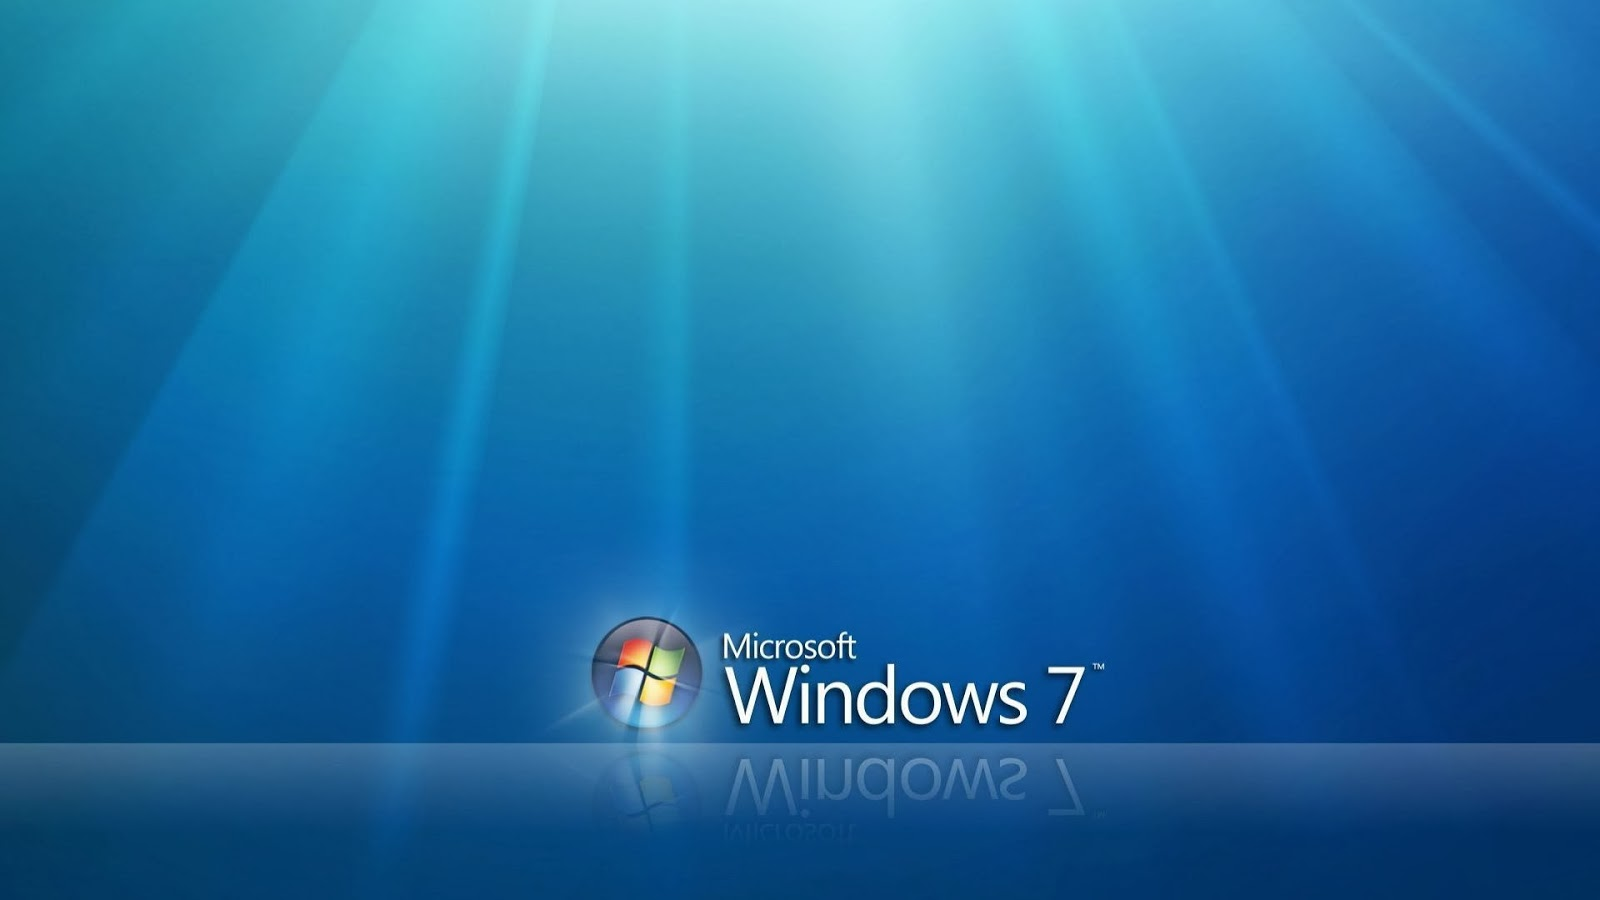 HD Windows Wallpapers 1080p 1600x900